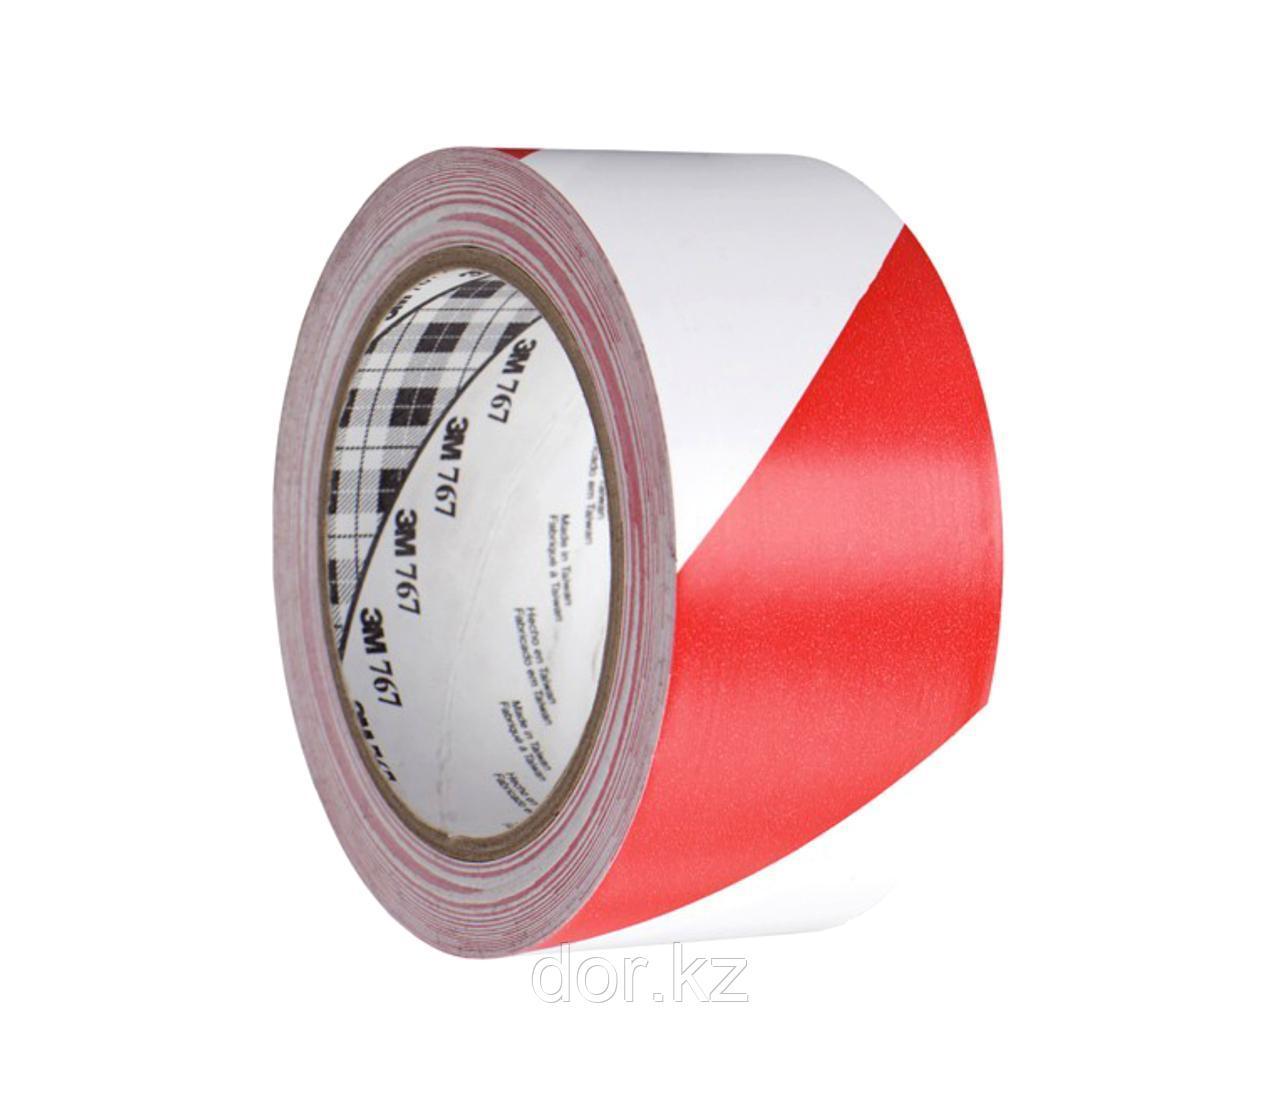 Разметочная лента 3М™ в красно-белую полоску (0,13мм) 50ммХ33м